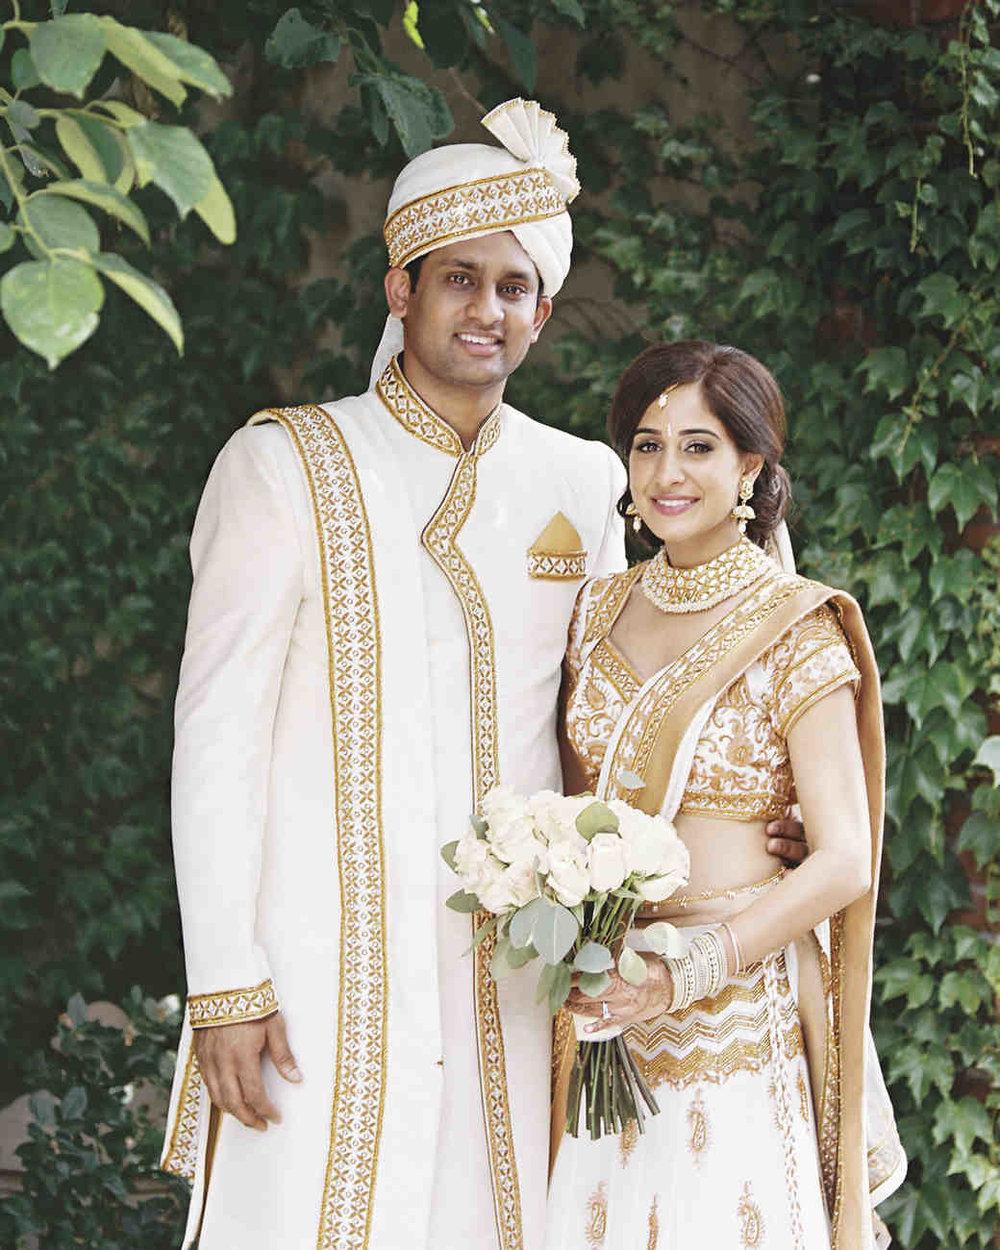 sejal-narayana-wedding-georgia-401-s111893_vert.jpg